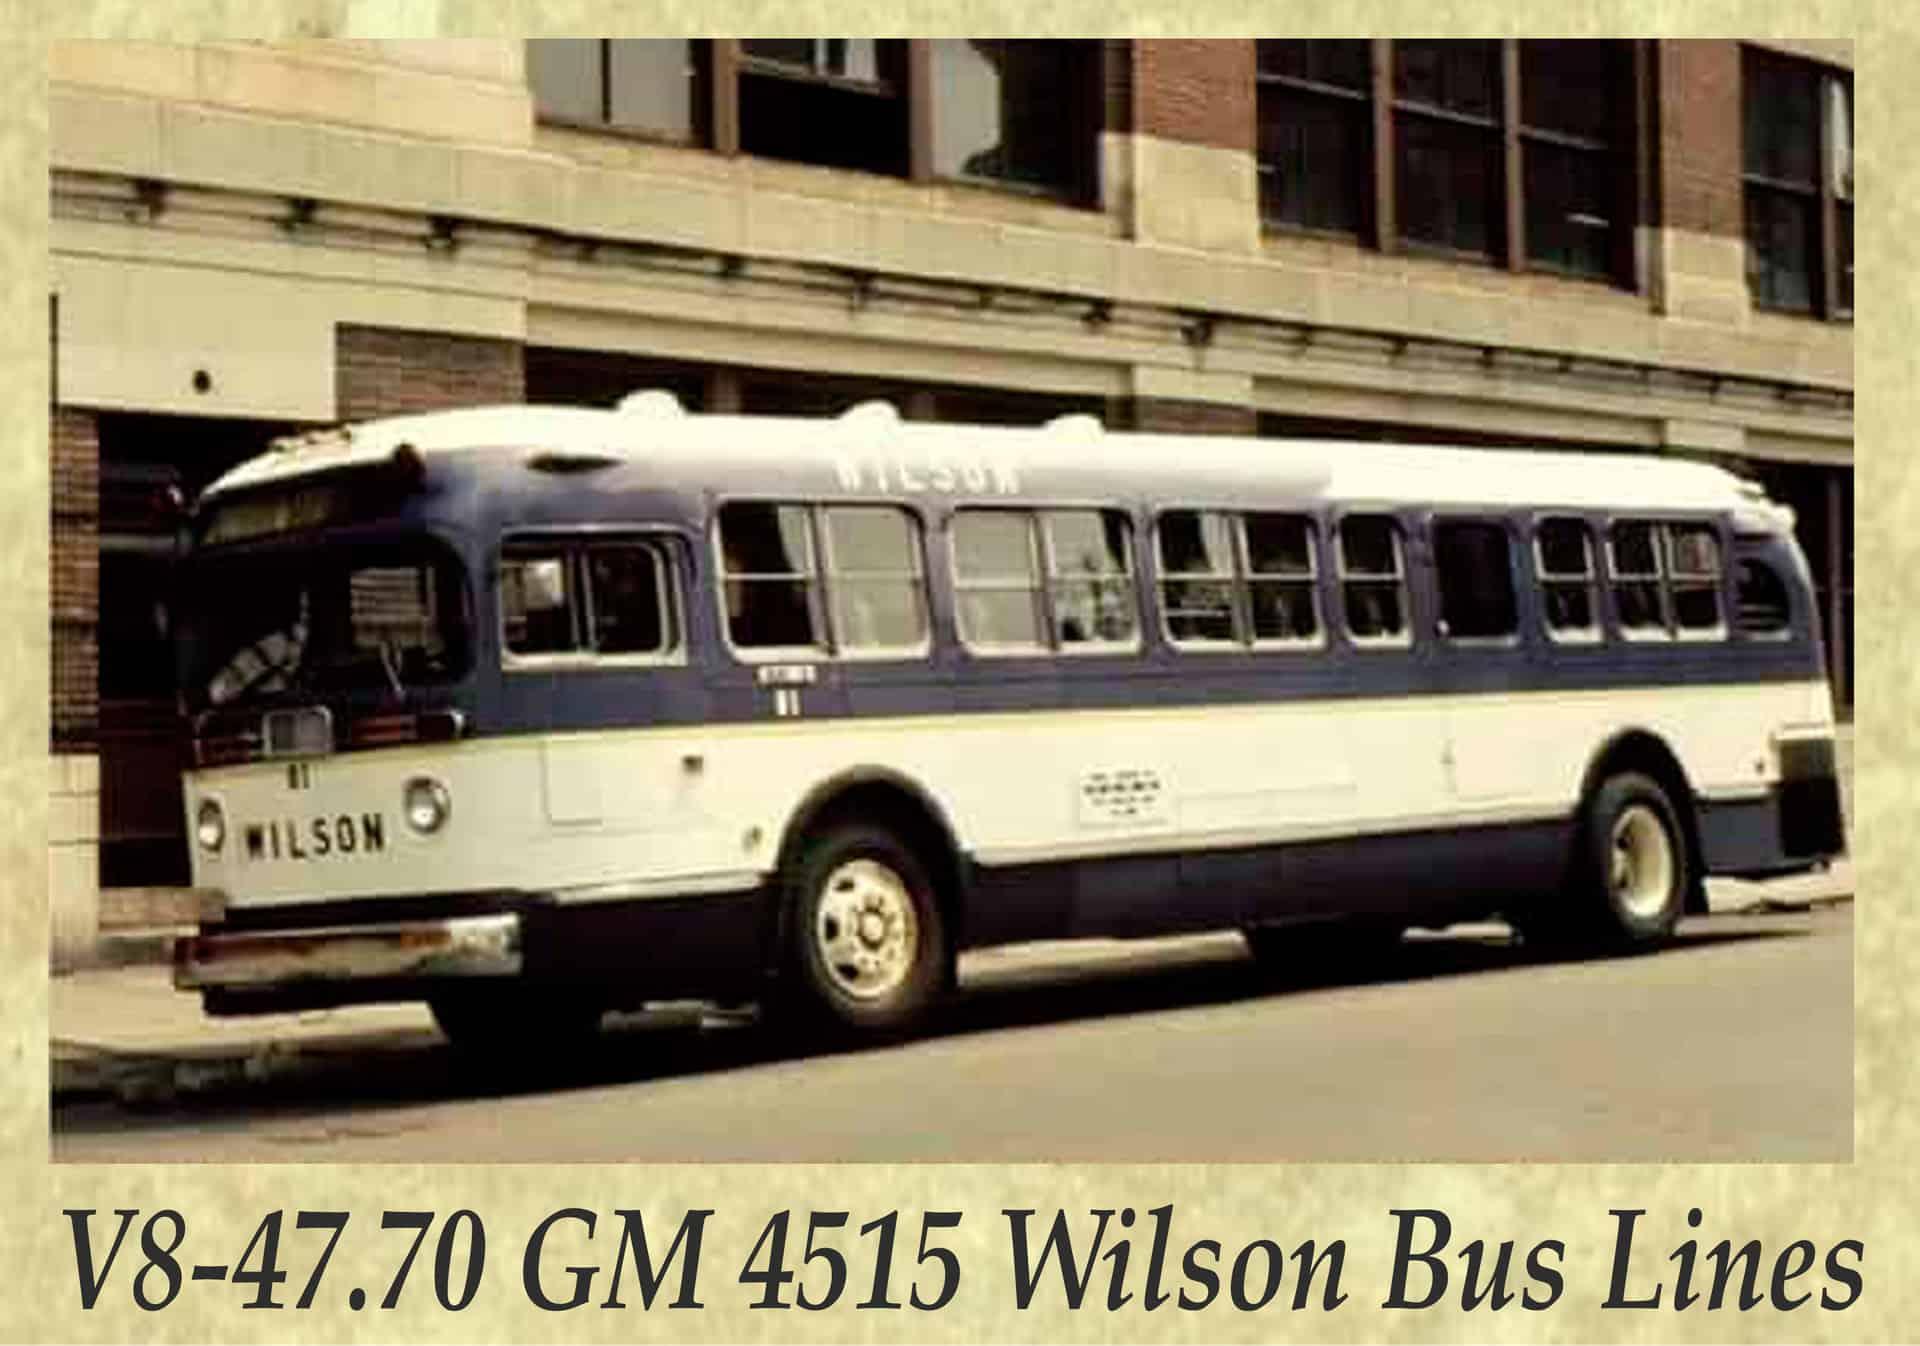 V8-47.70 GM 4515 Wilson Bus Lines